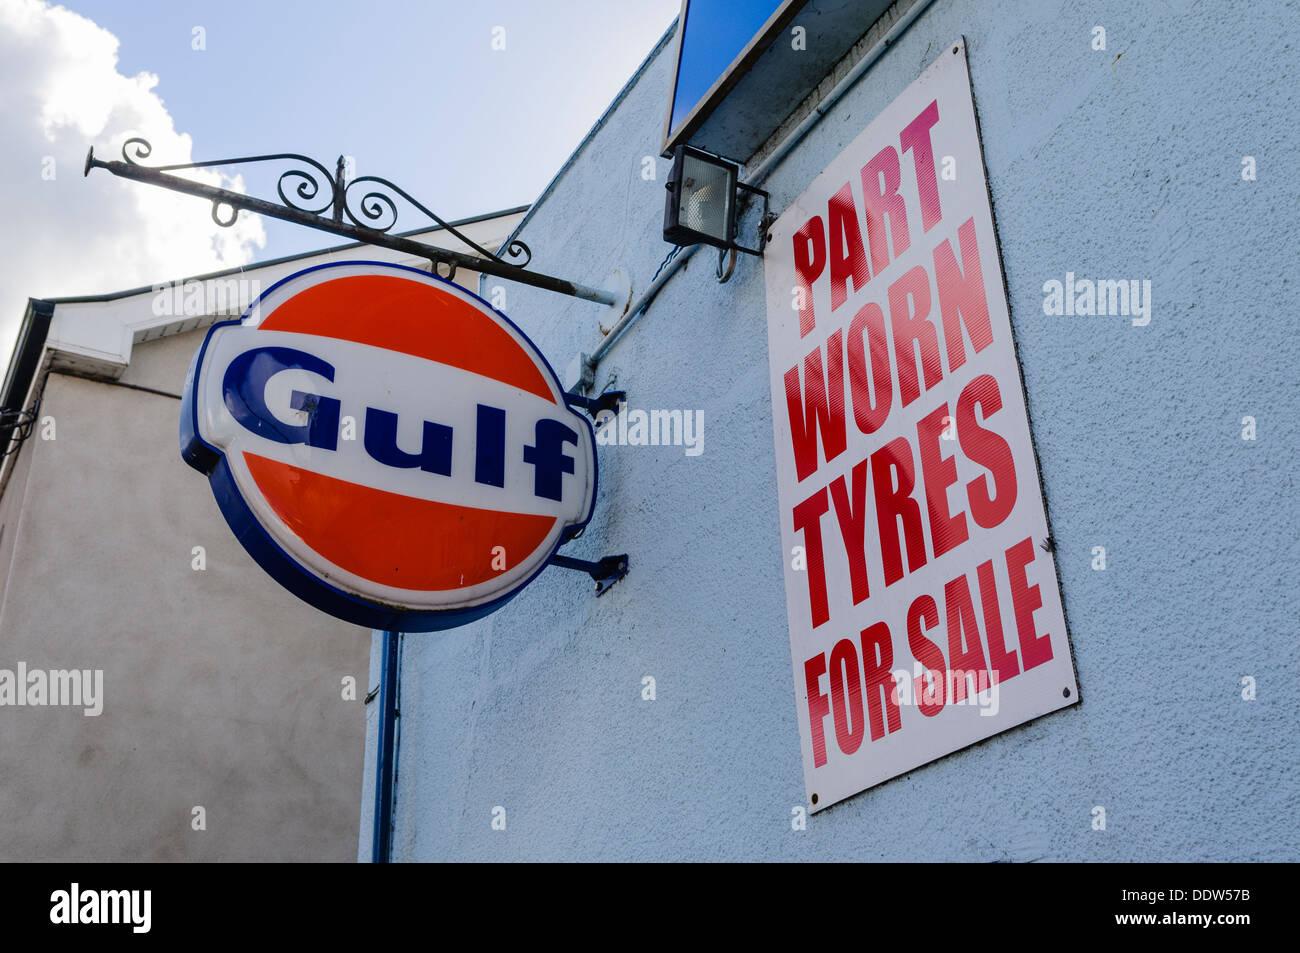 Gulf Petrol Station Stock Photos & Gulf Petrol Station Stock Images